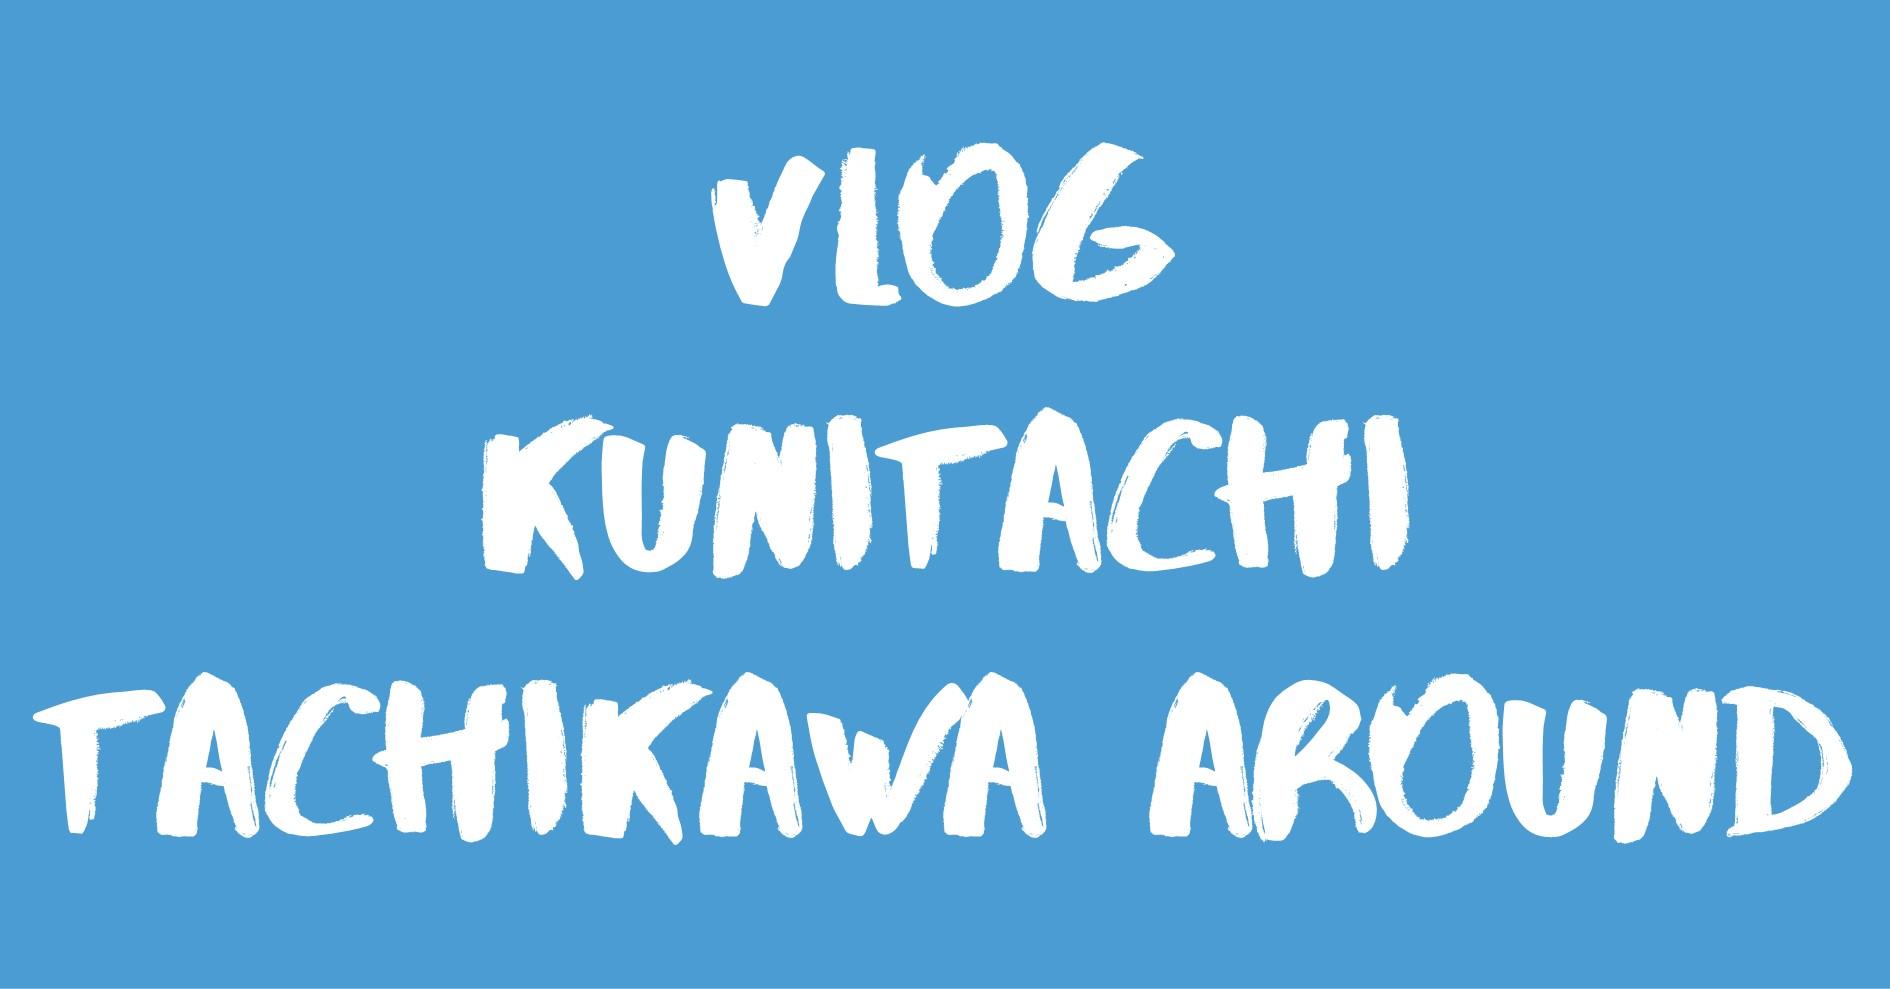 [Vlog] 国立&立川周辺エリア / Kunitachi, Tachikawa & Around